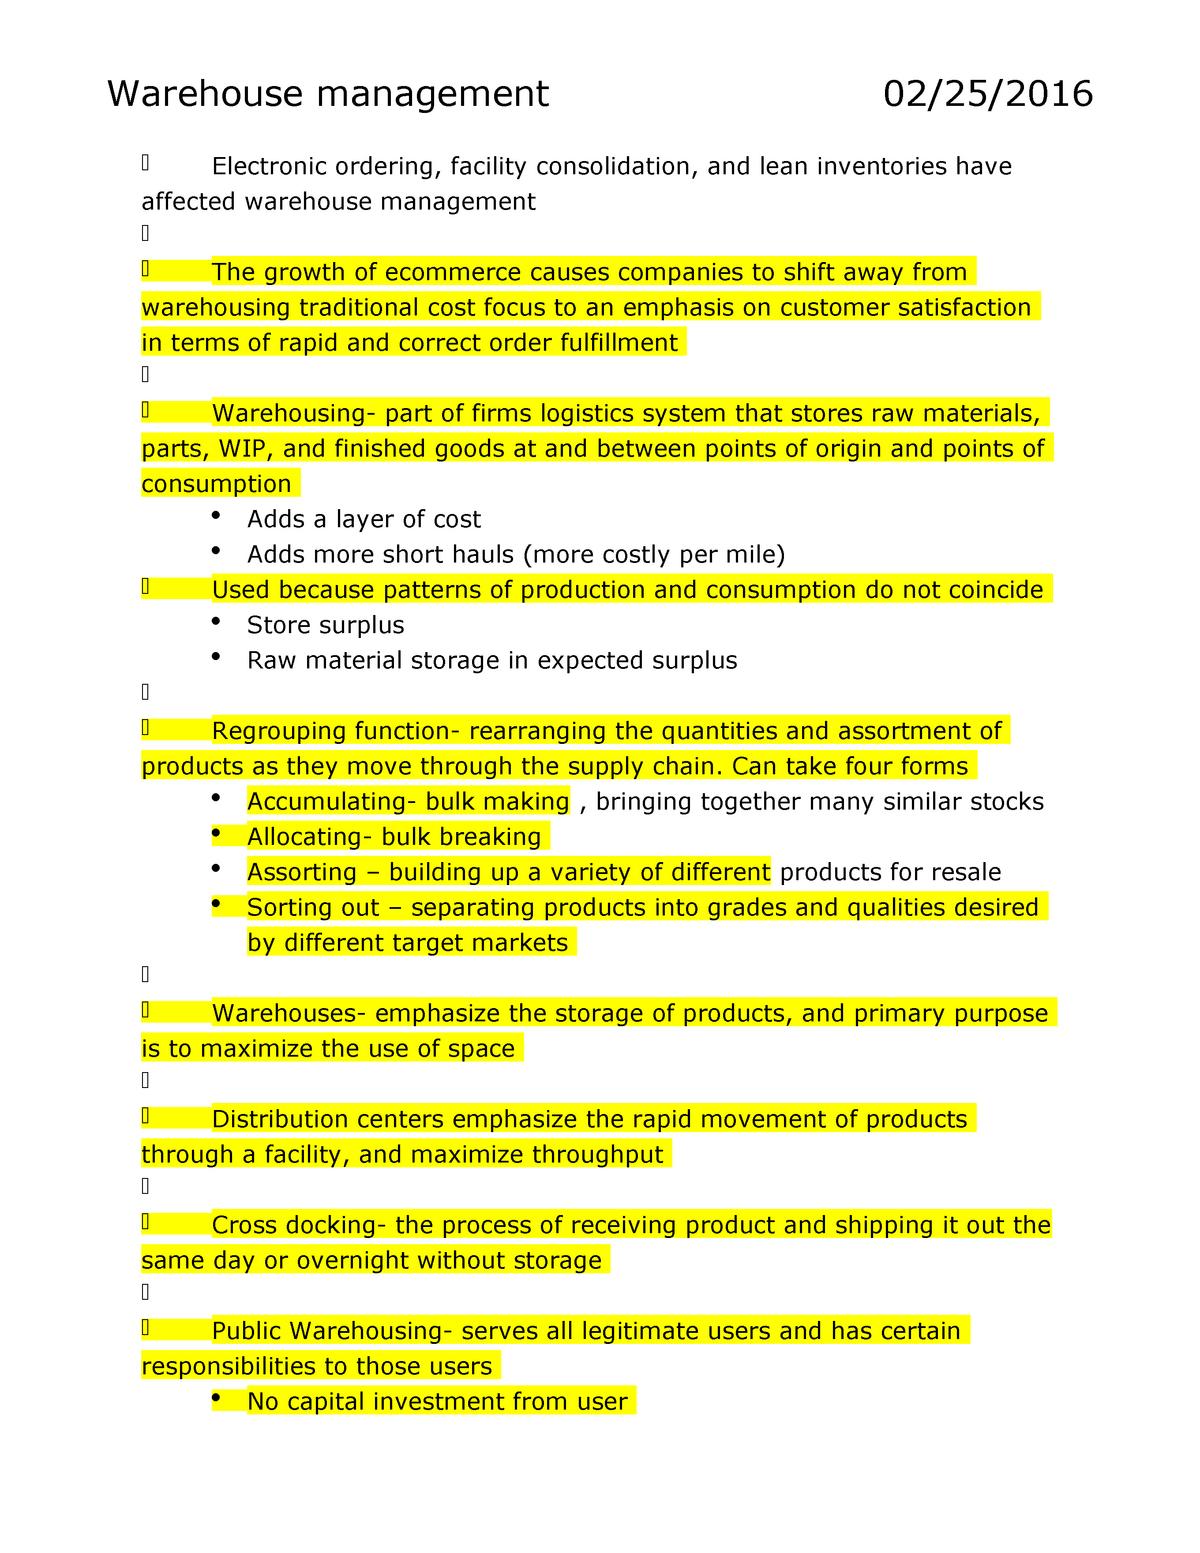 Chapter 10 - Summary Logistics Management - BUSML 3380 - StuDocu